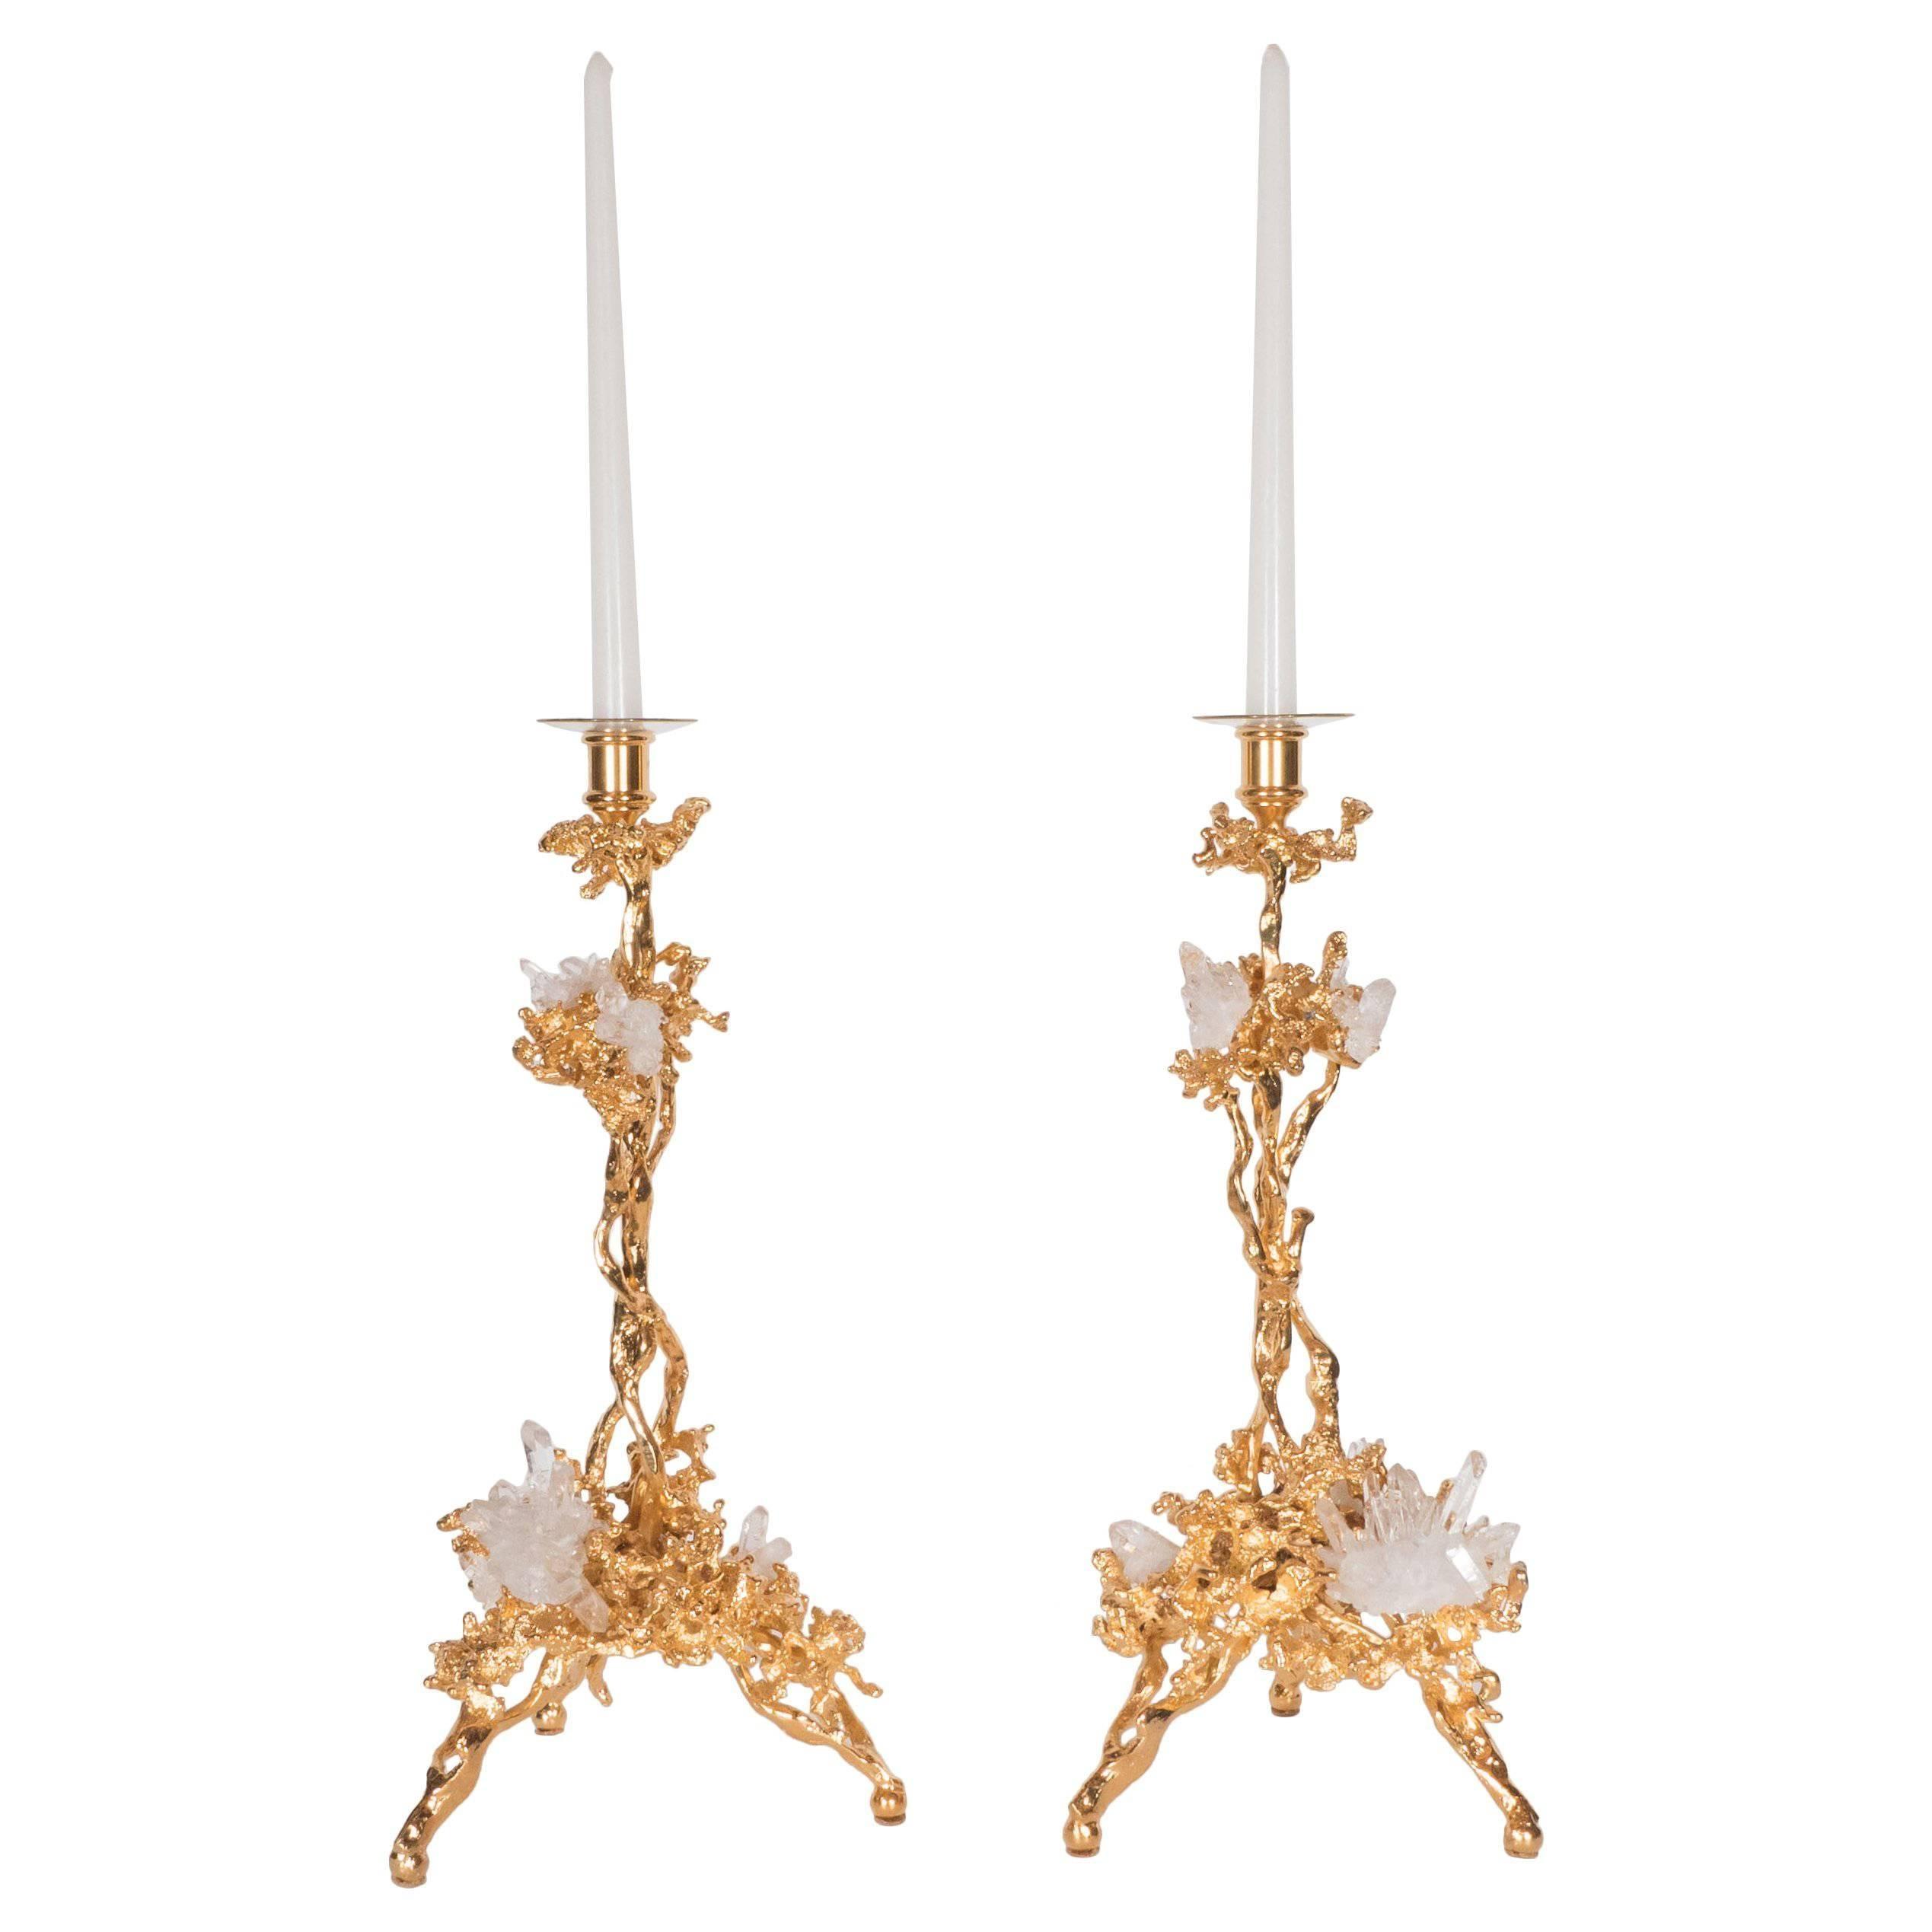 Pair of Single Branch 24-Karat Gold-Plated Bronze Candlesticks by Claude Boeltz